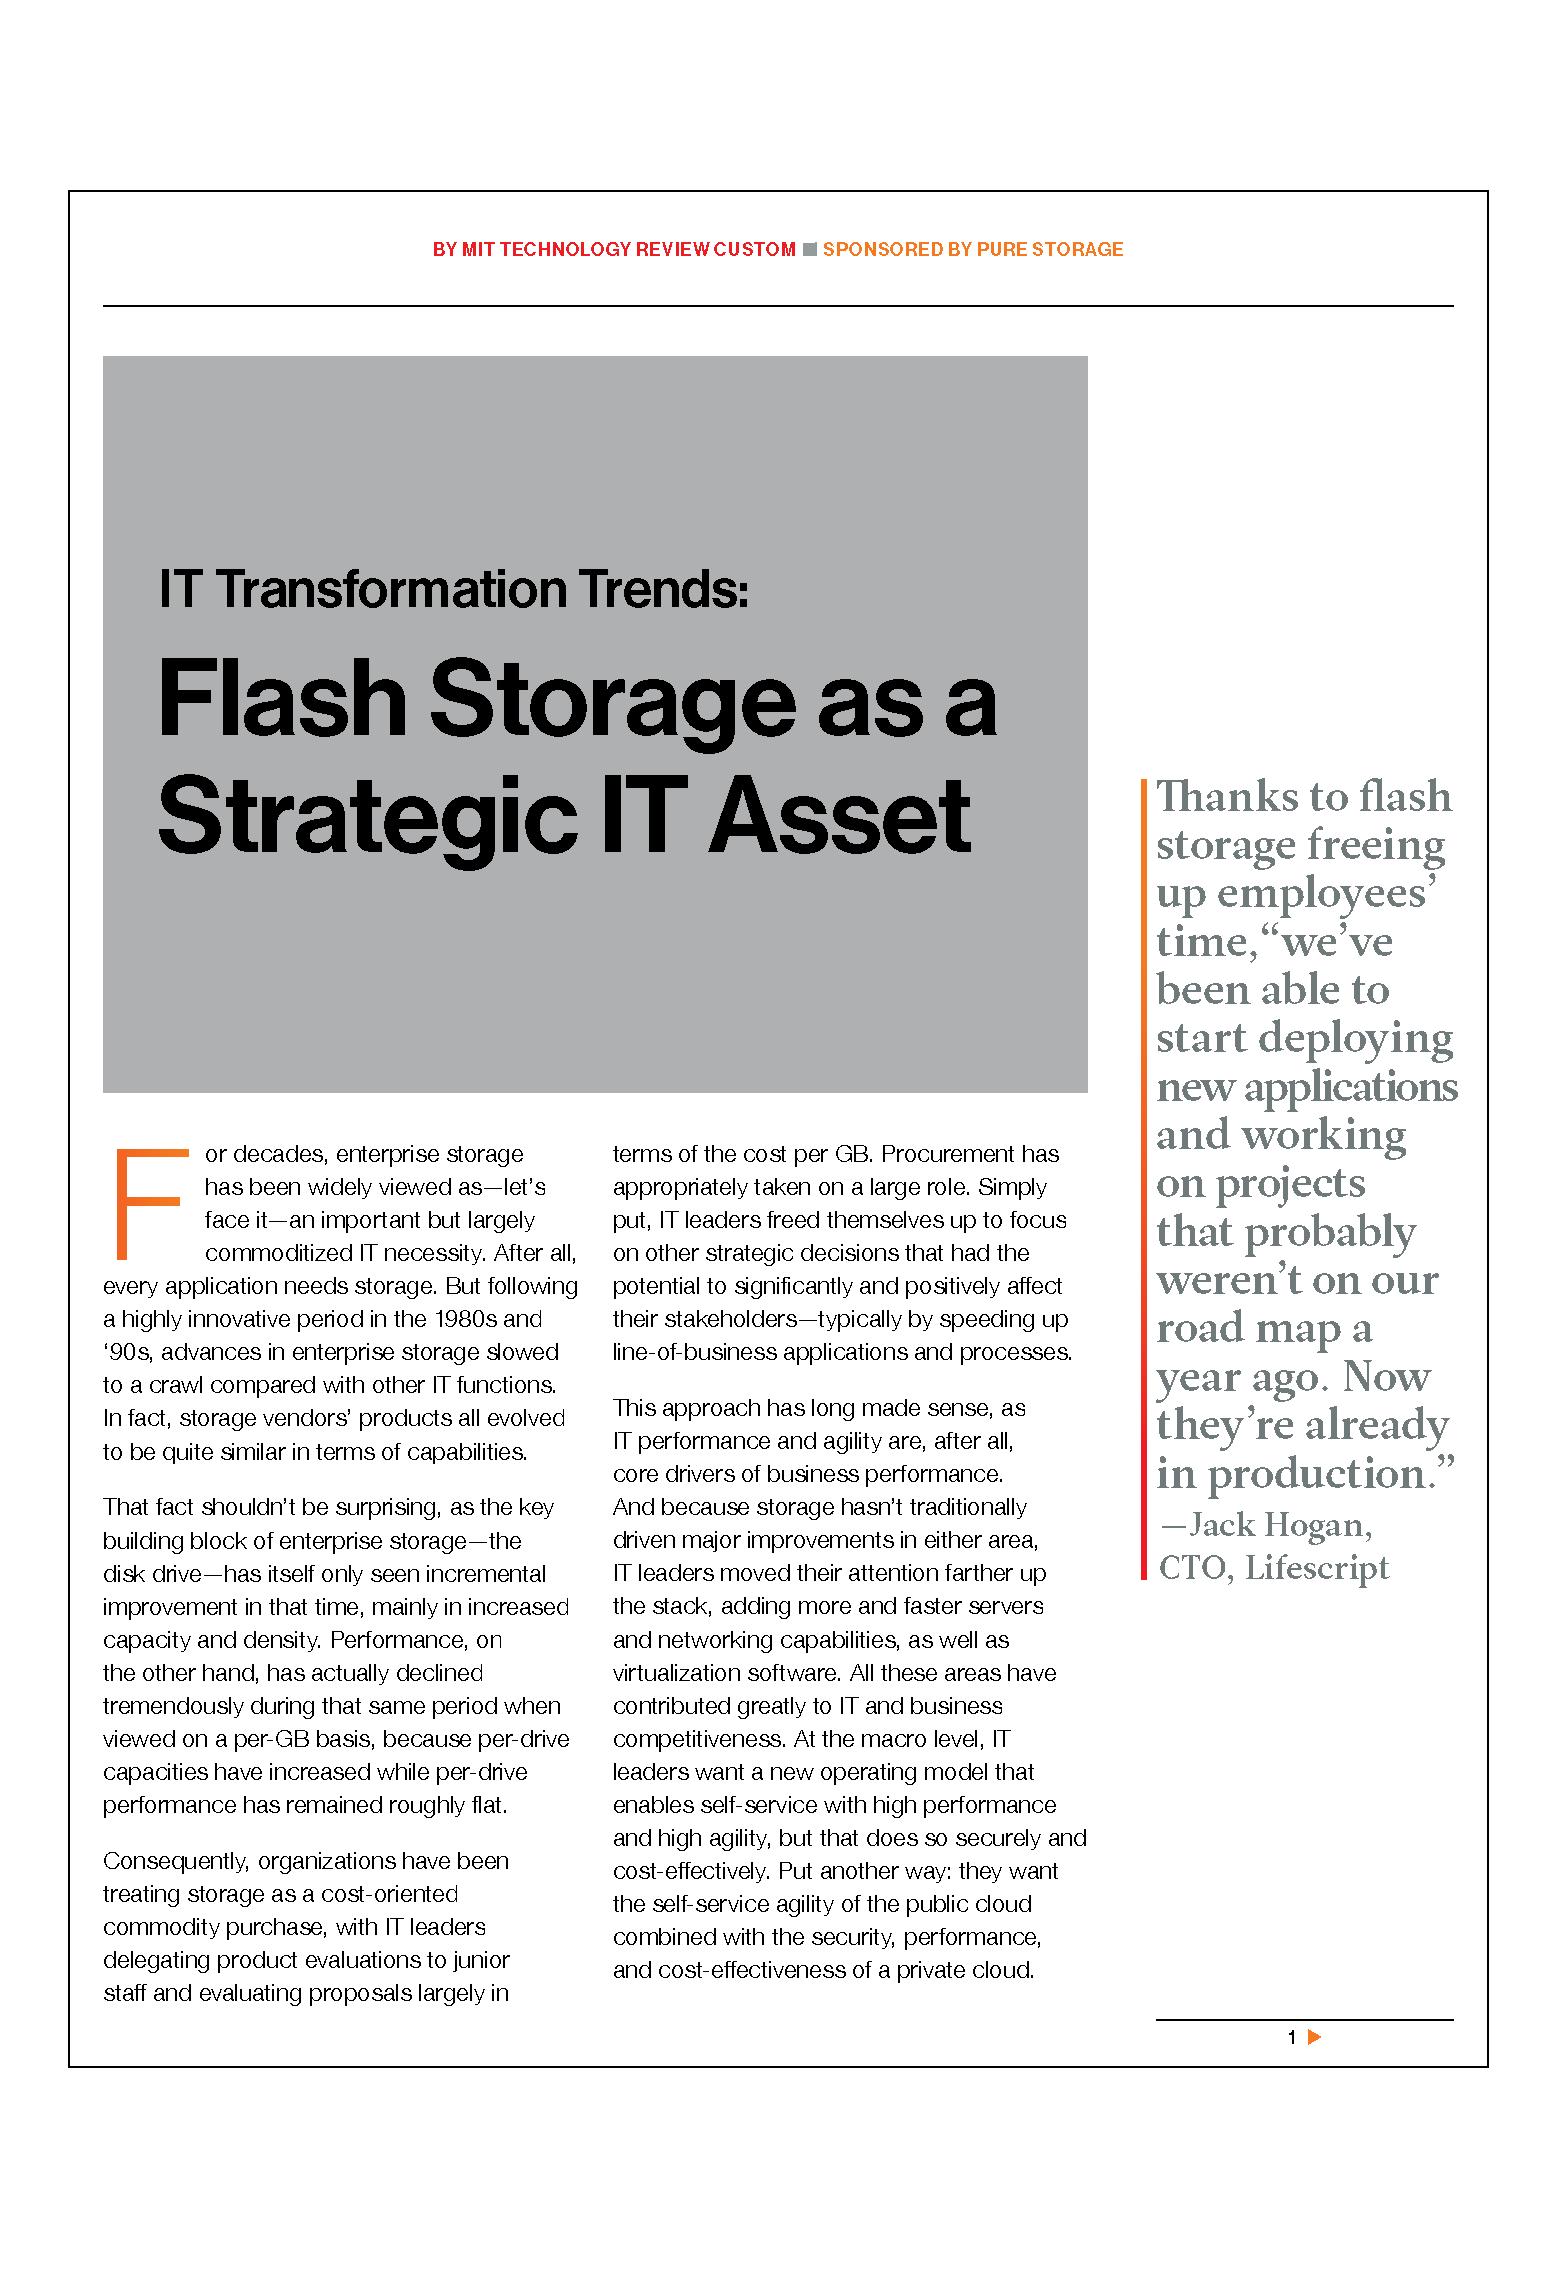 Almacenamiento flash como un activo estratégico de TI